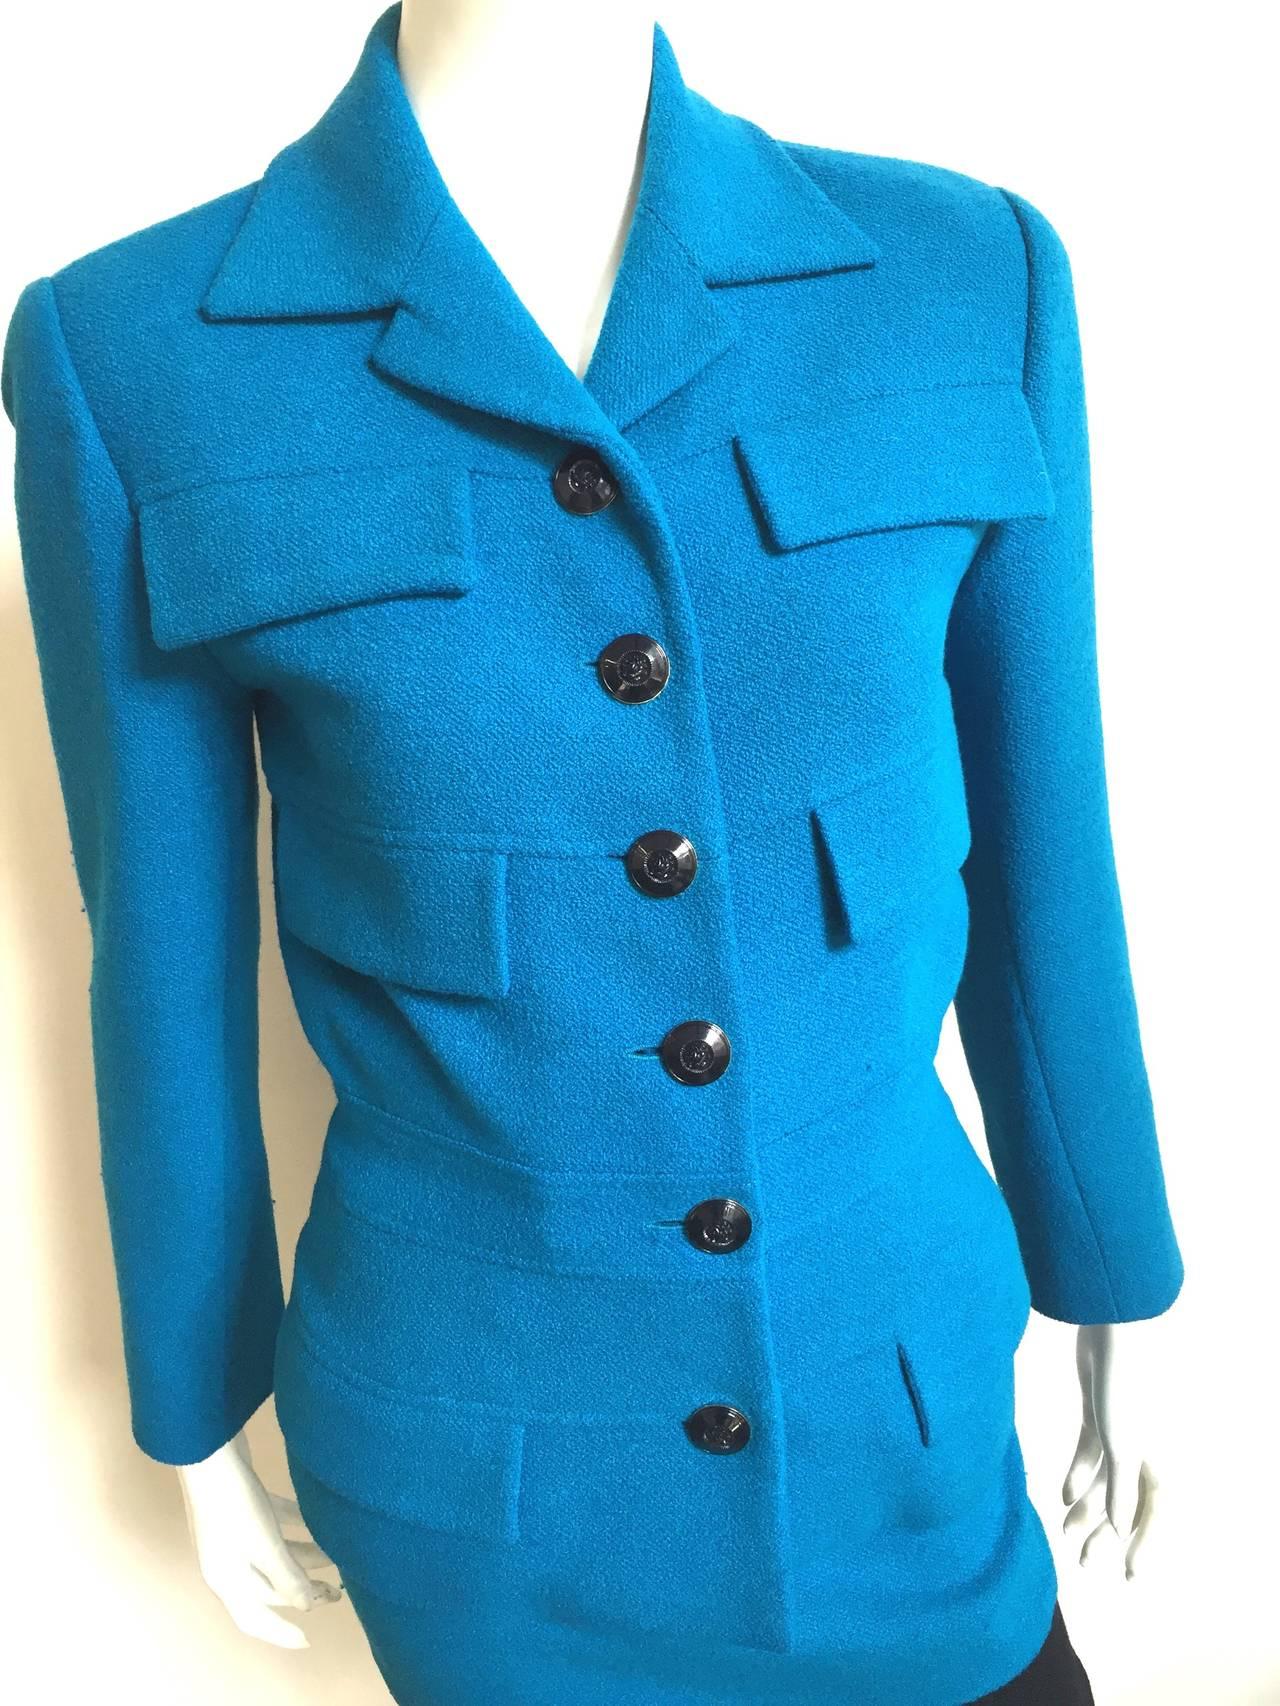 Karl Lagerfeld 80s Wool Skirt Suit Size 4. 2